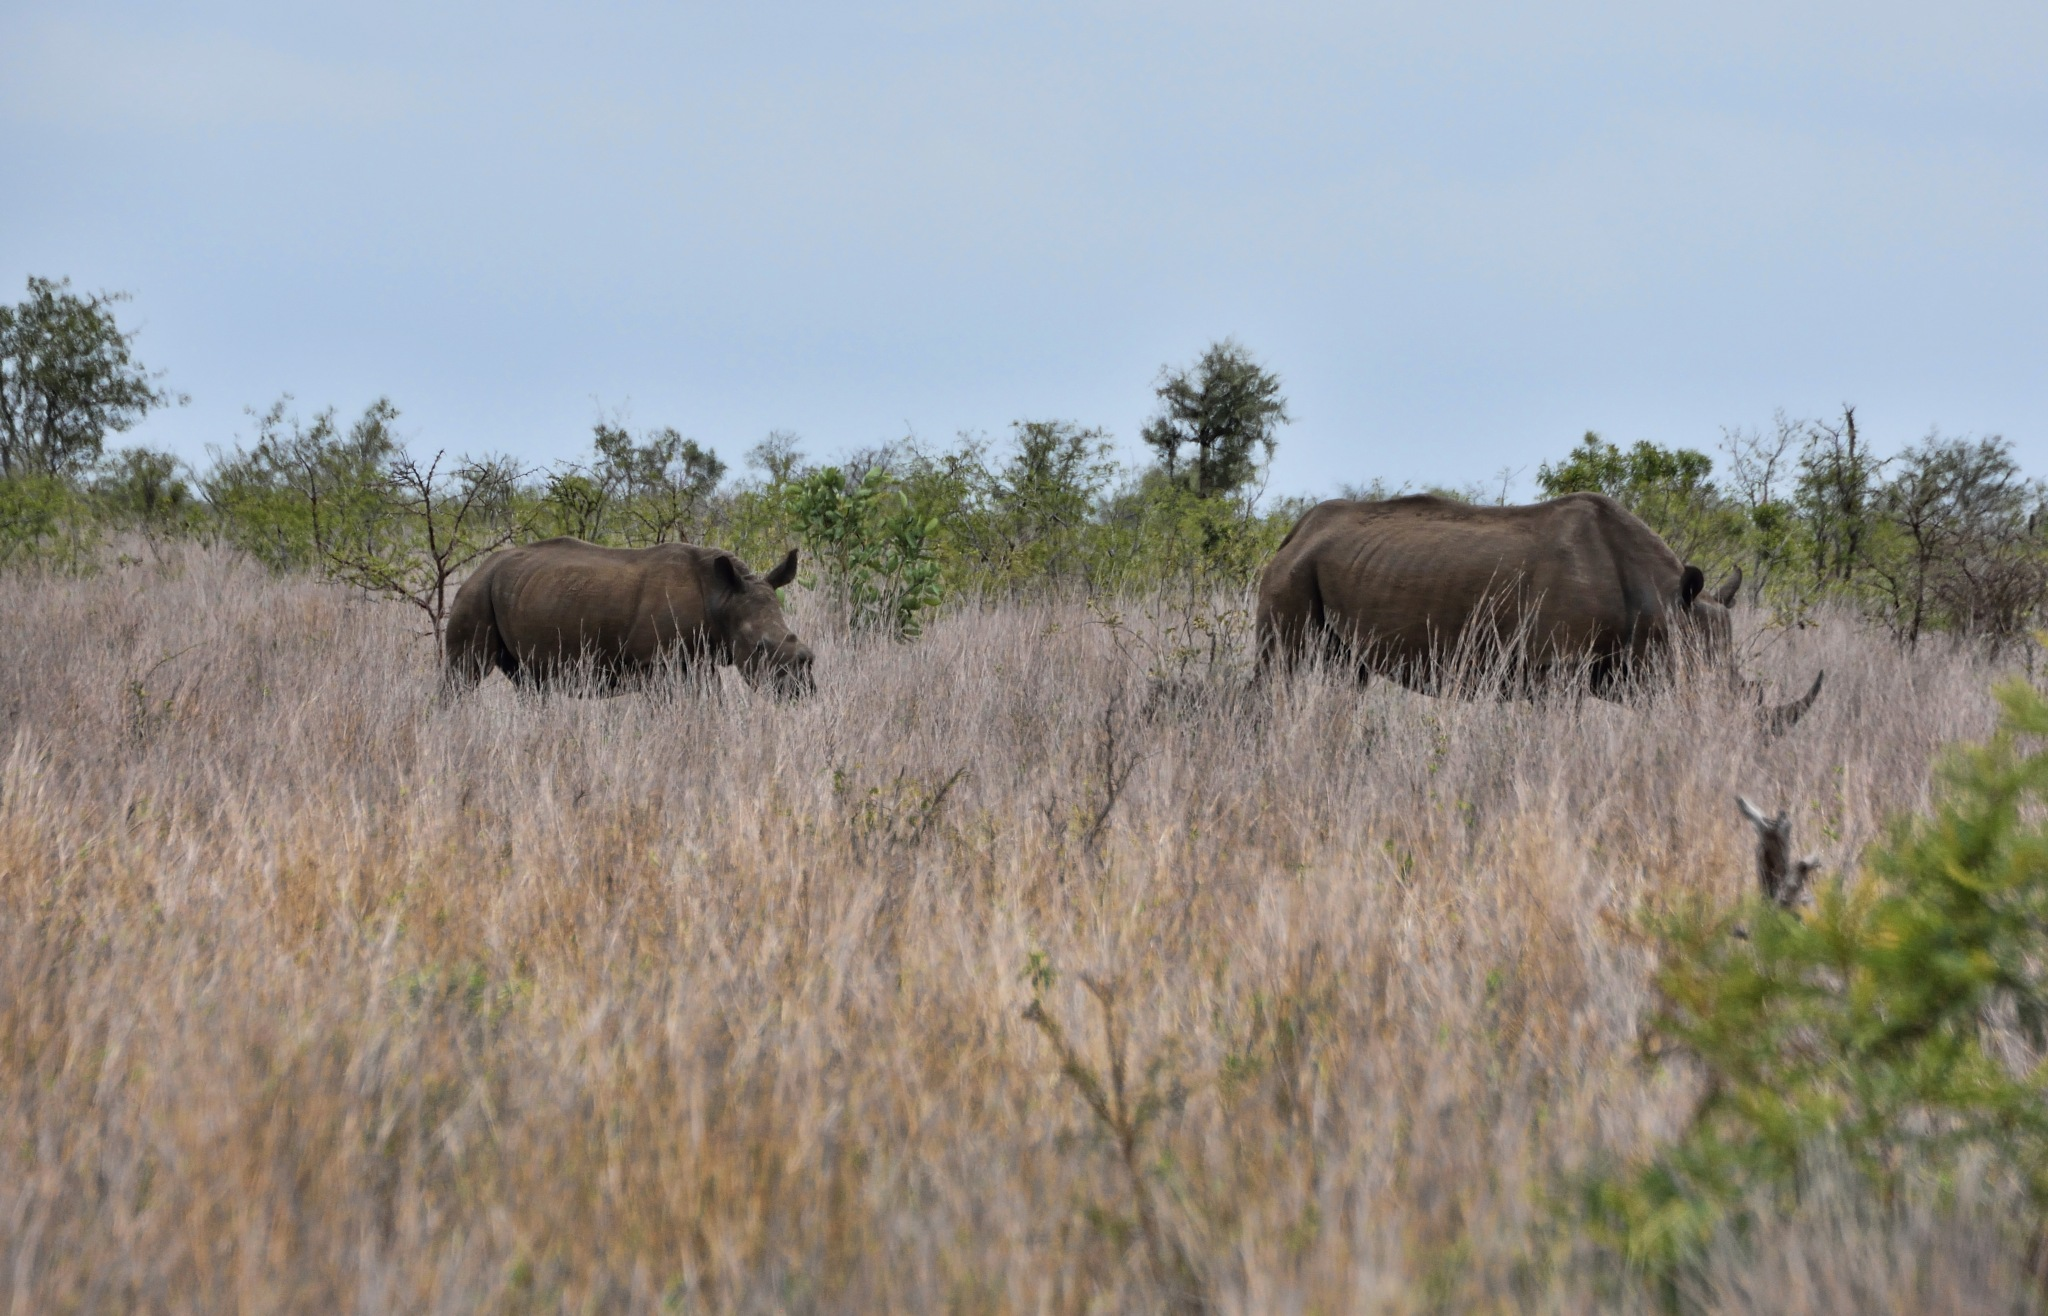 South Africa - Kruger Park (129) White Rhinoceros by Derek Clarke